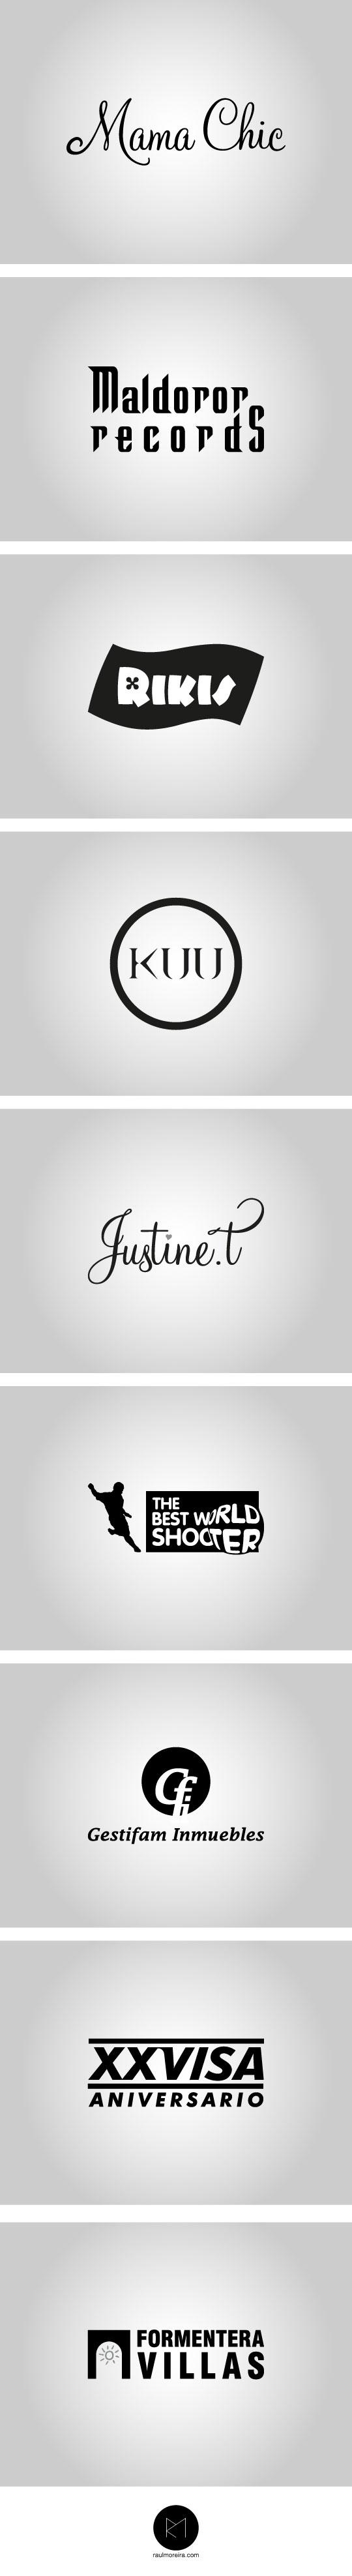 Logotipos - varios